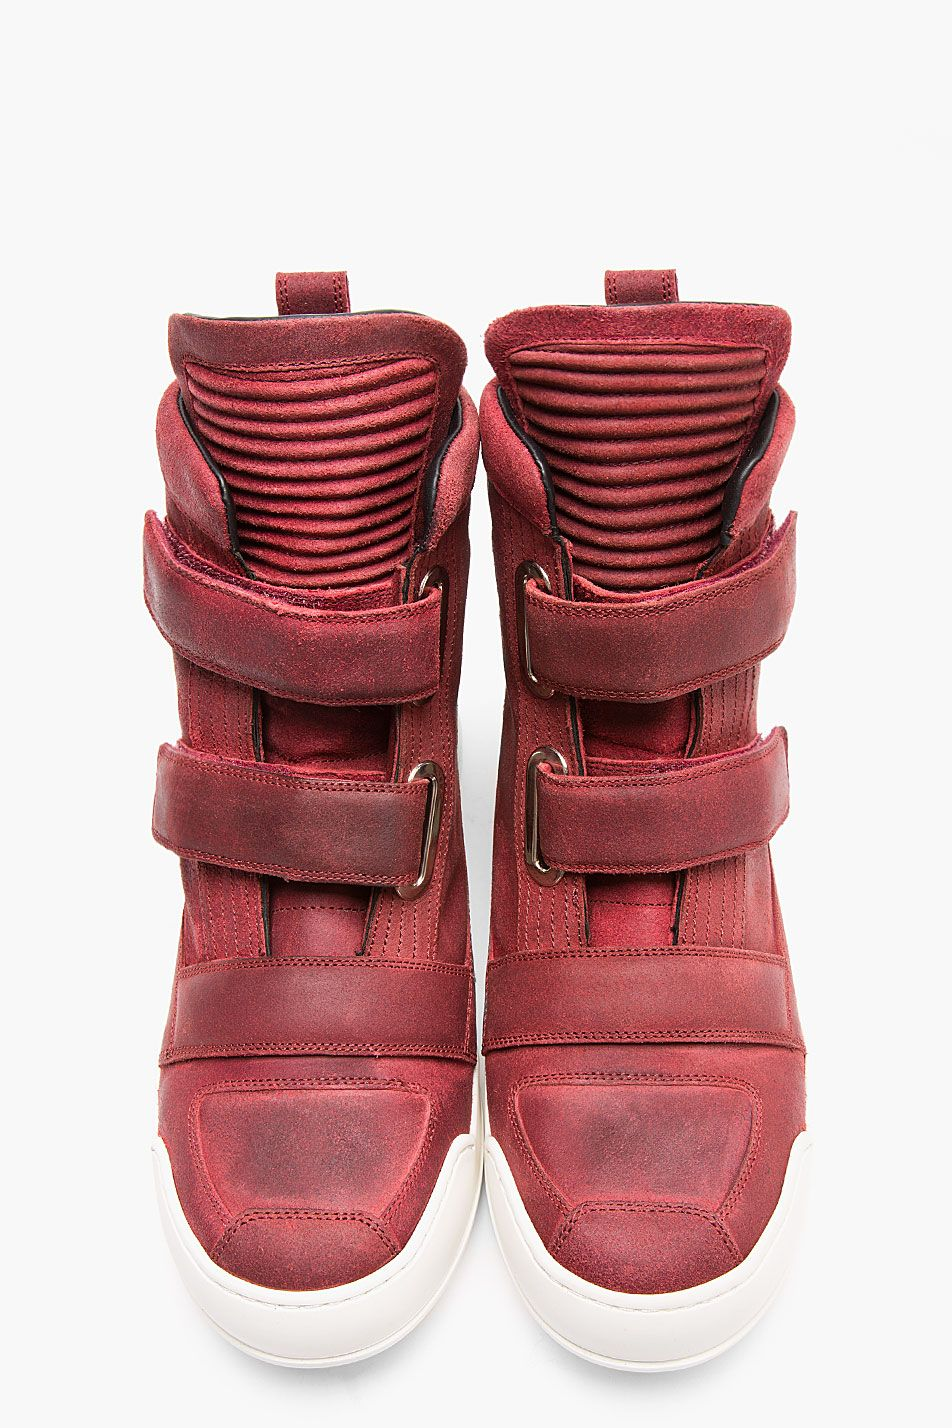 351f5b928046da Balmain Red Suede Velcro Biker High-top Sneakers for men